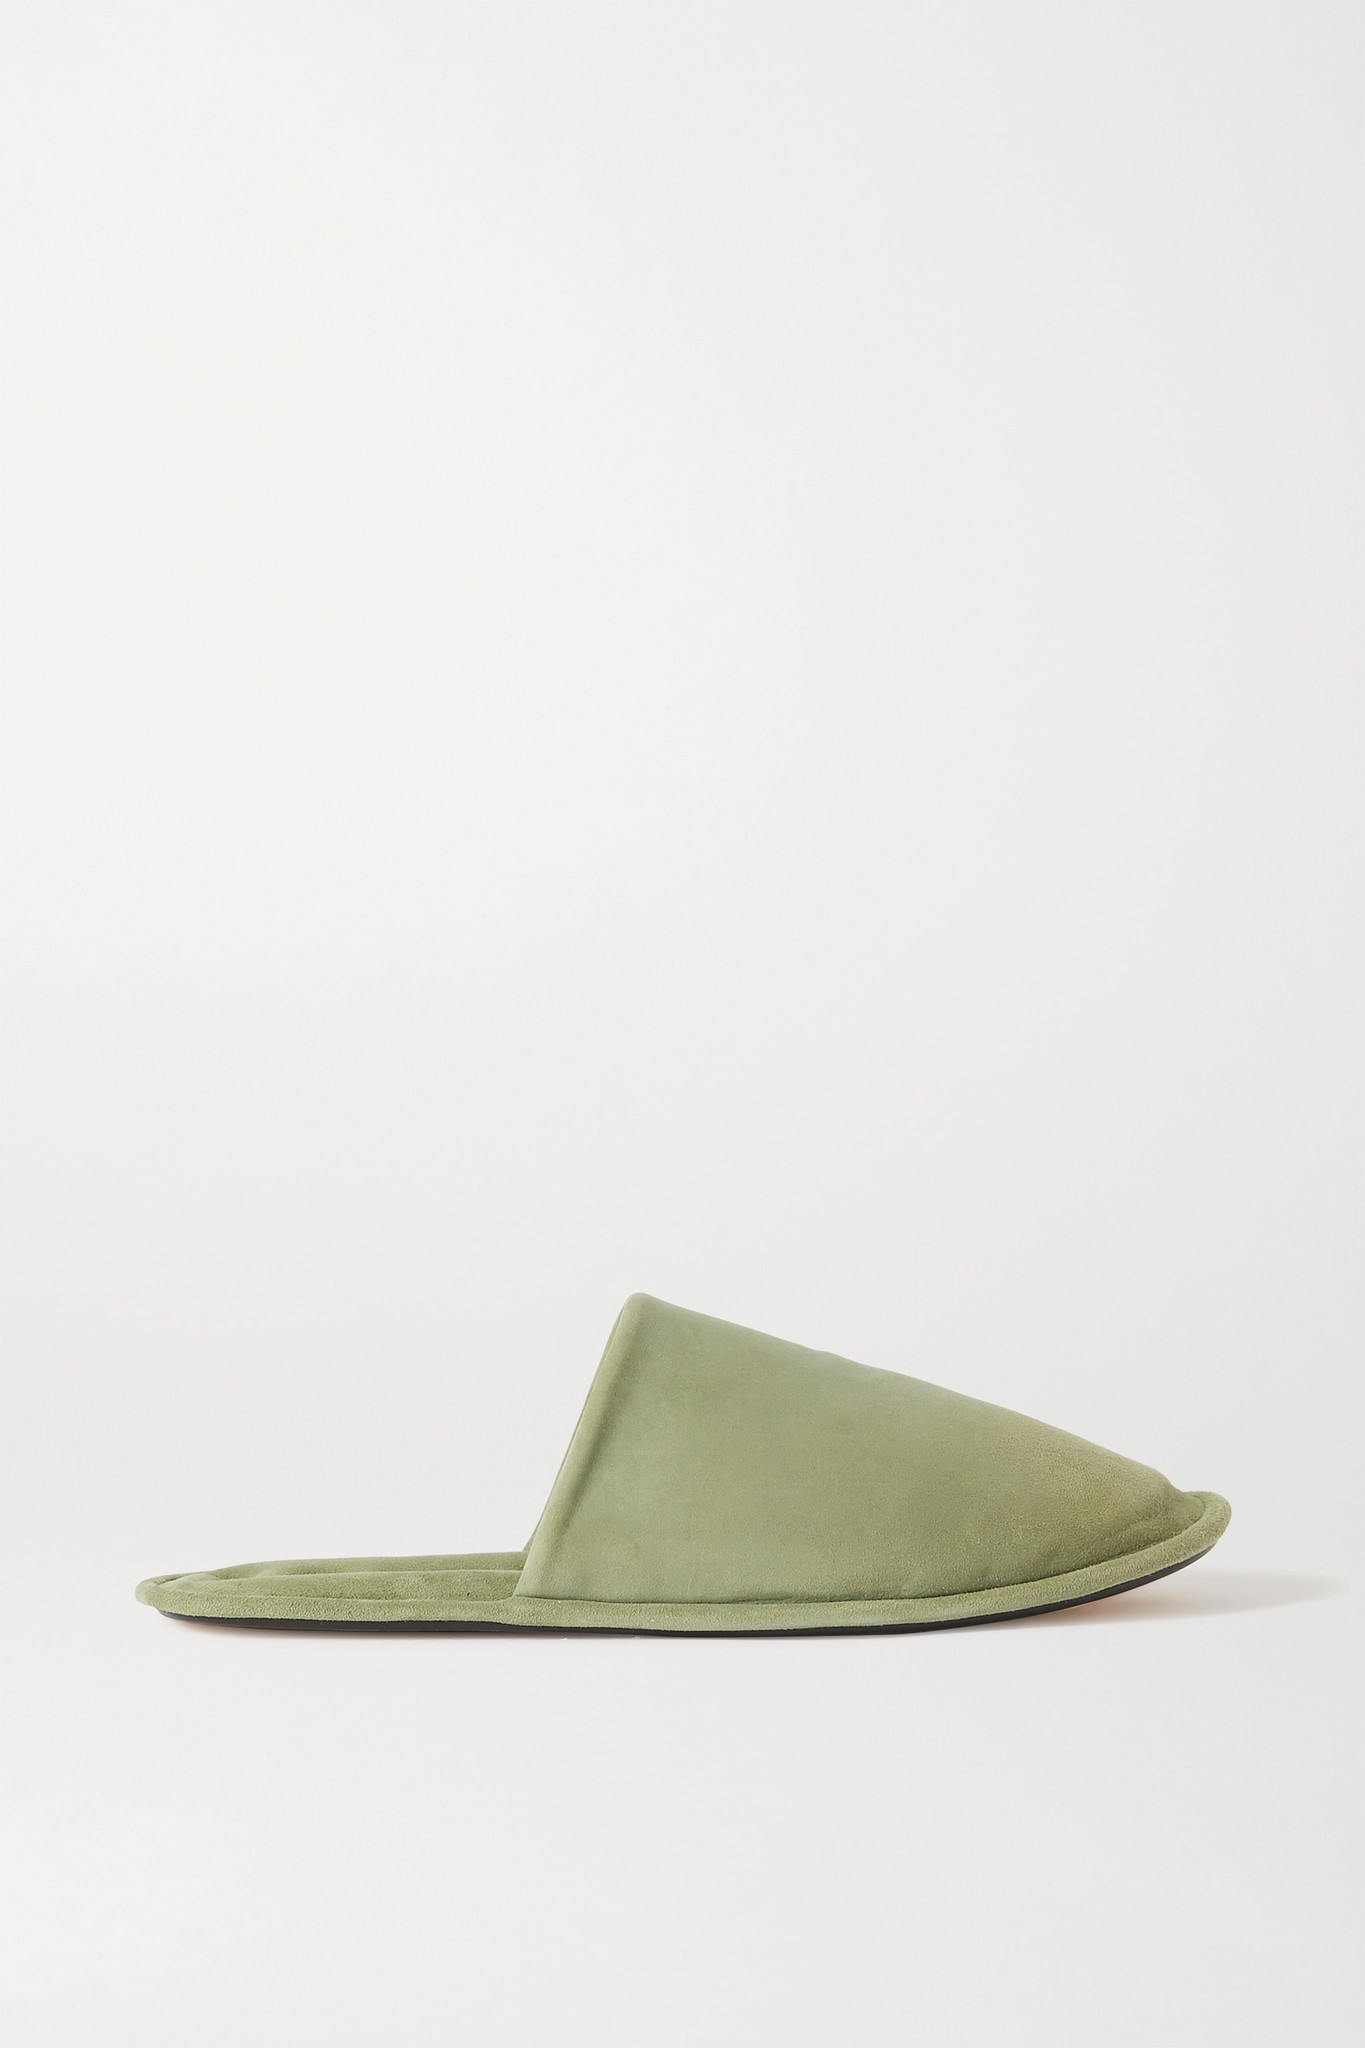 LOEWE - 绒面革拖鞋 - 绿色 - IT38